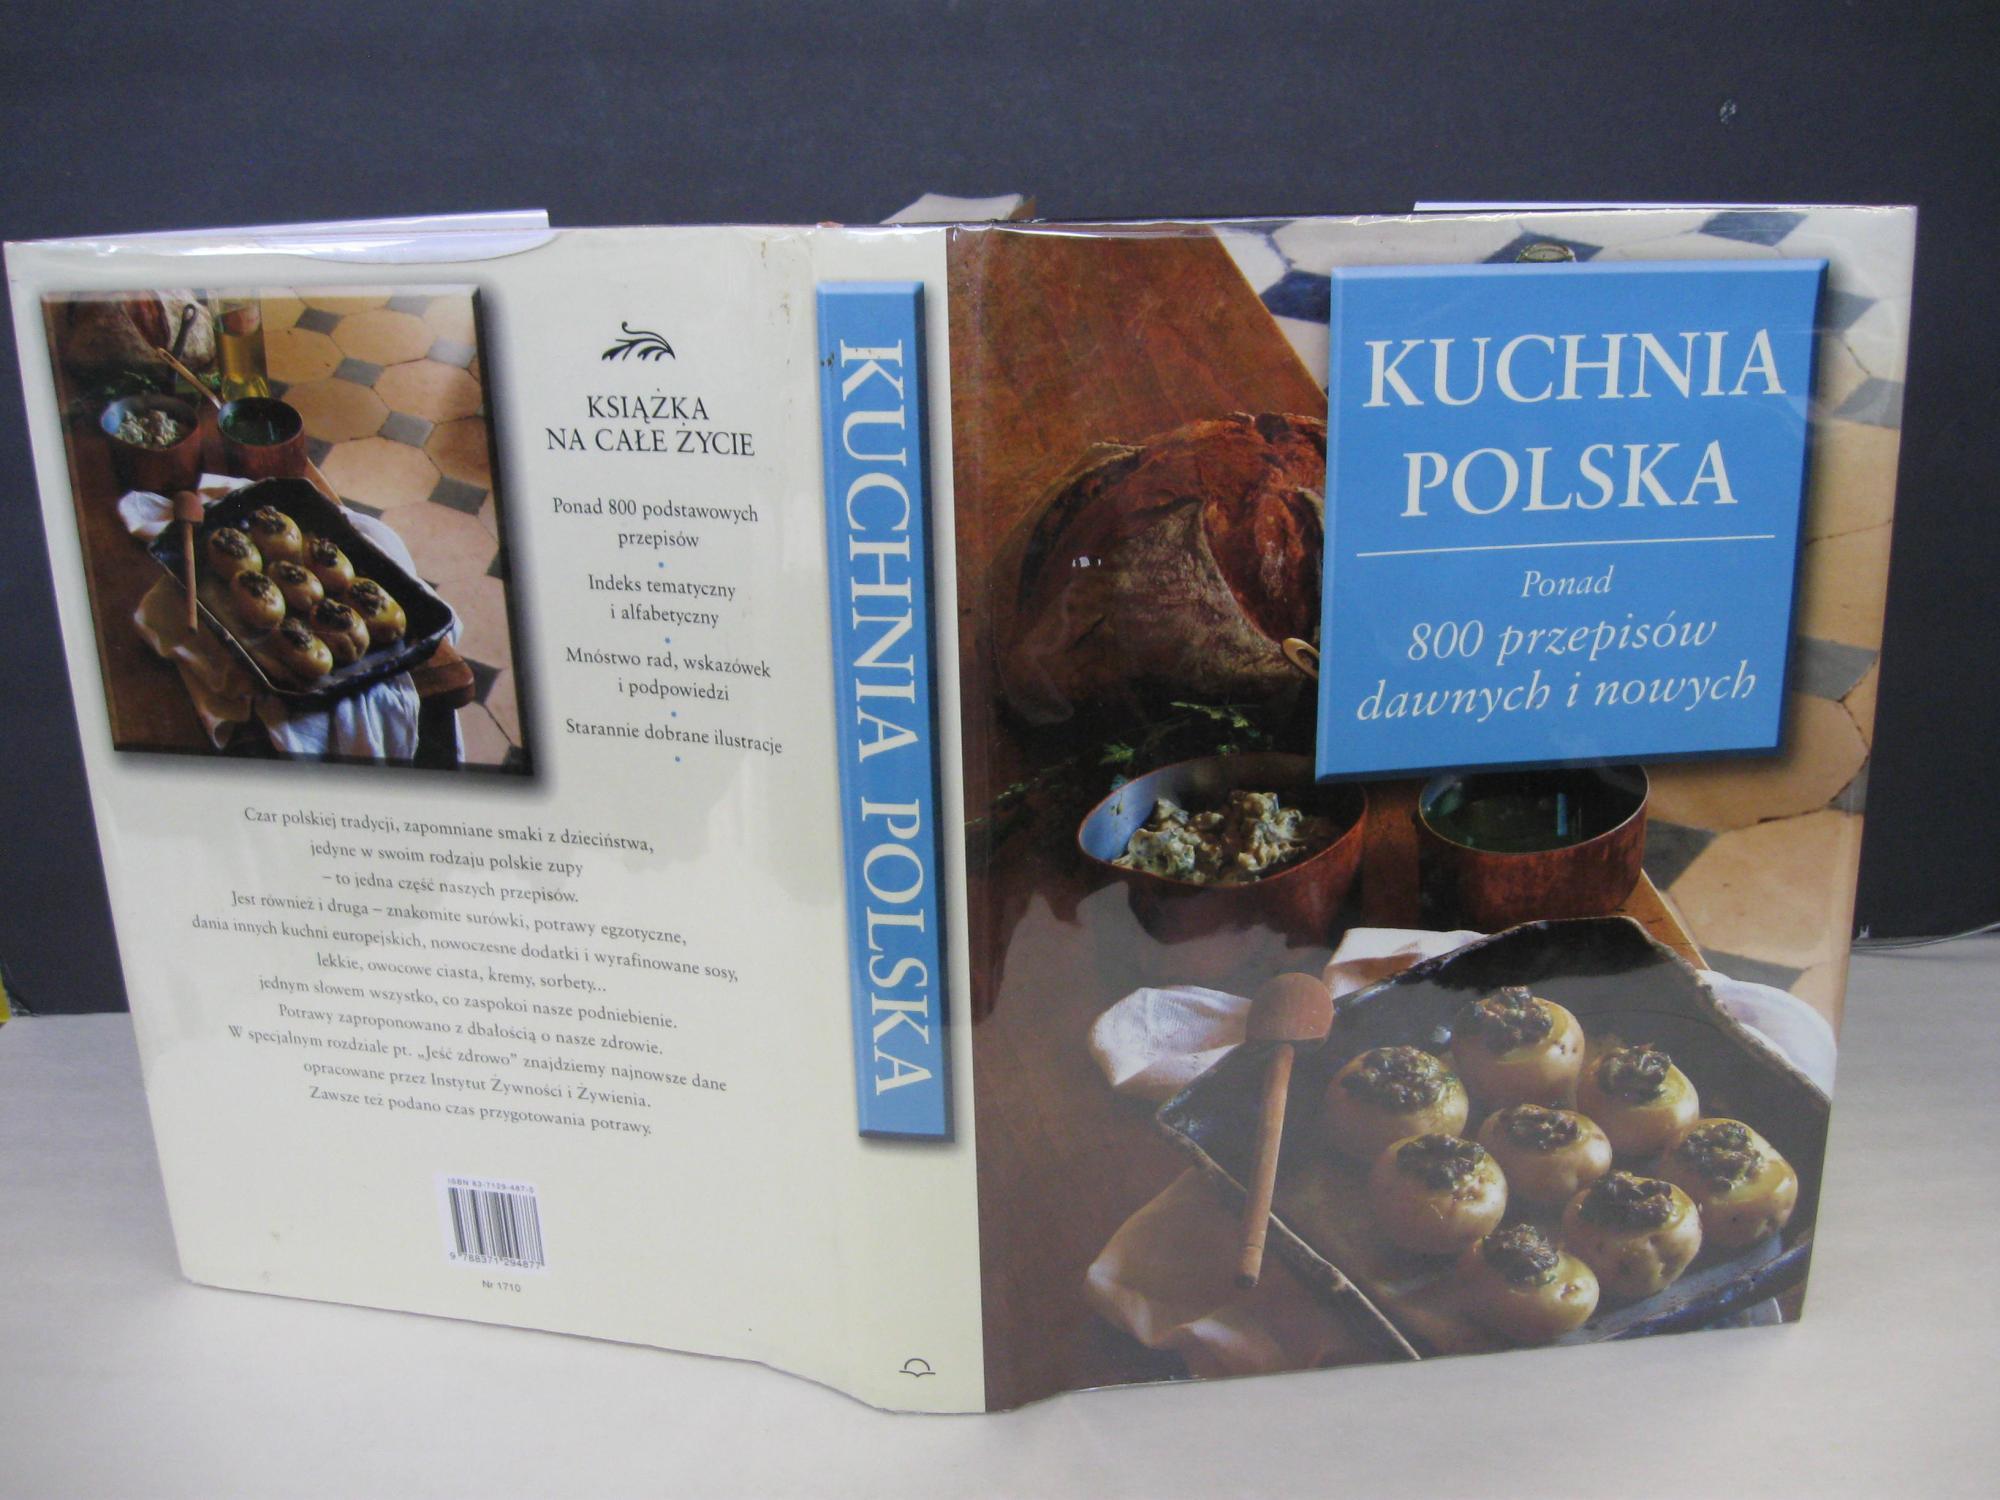 Kuchnia Polska Cuisine Of Poland